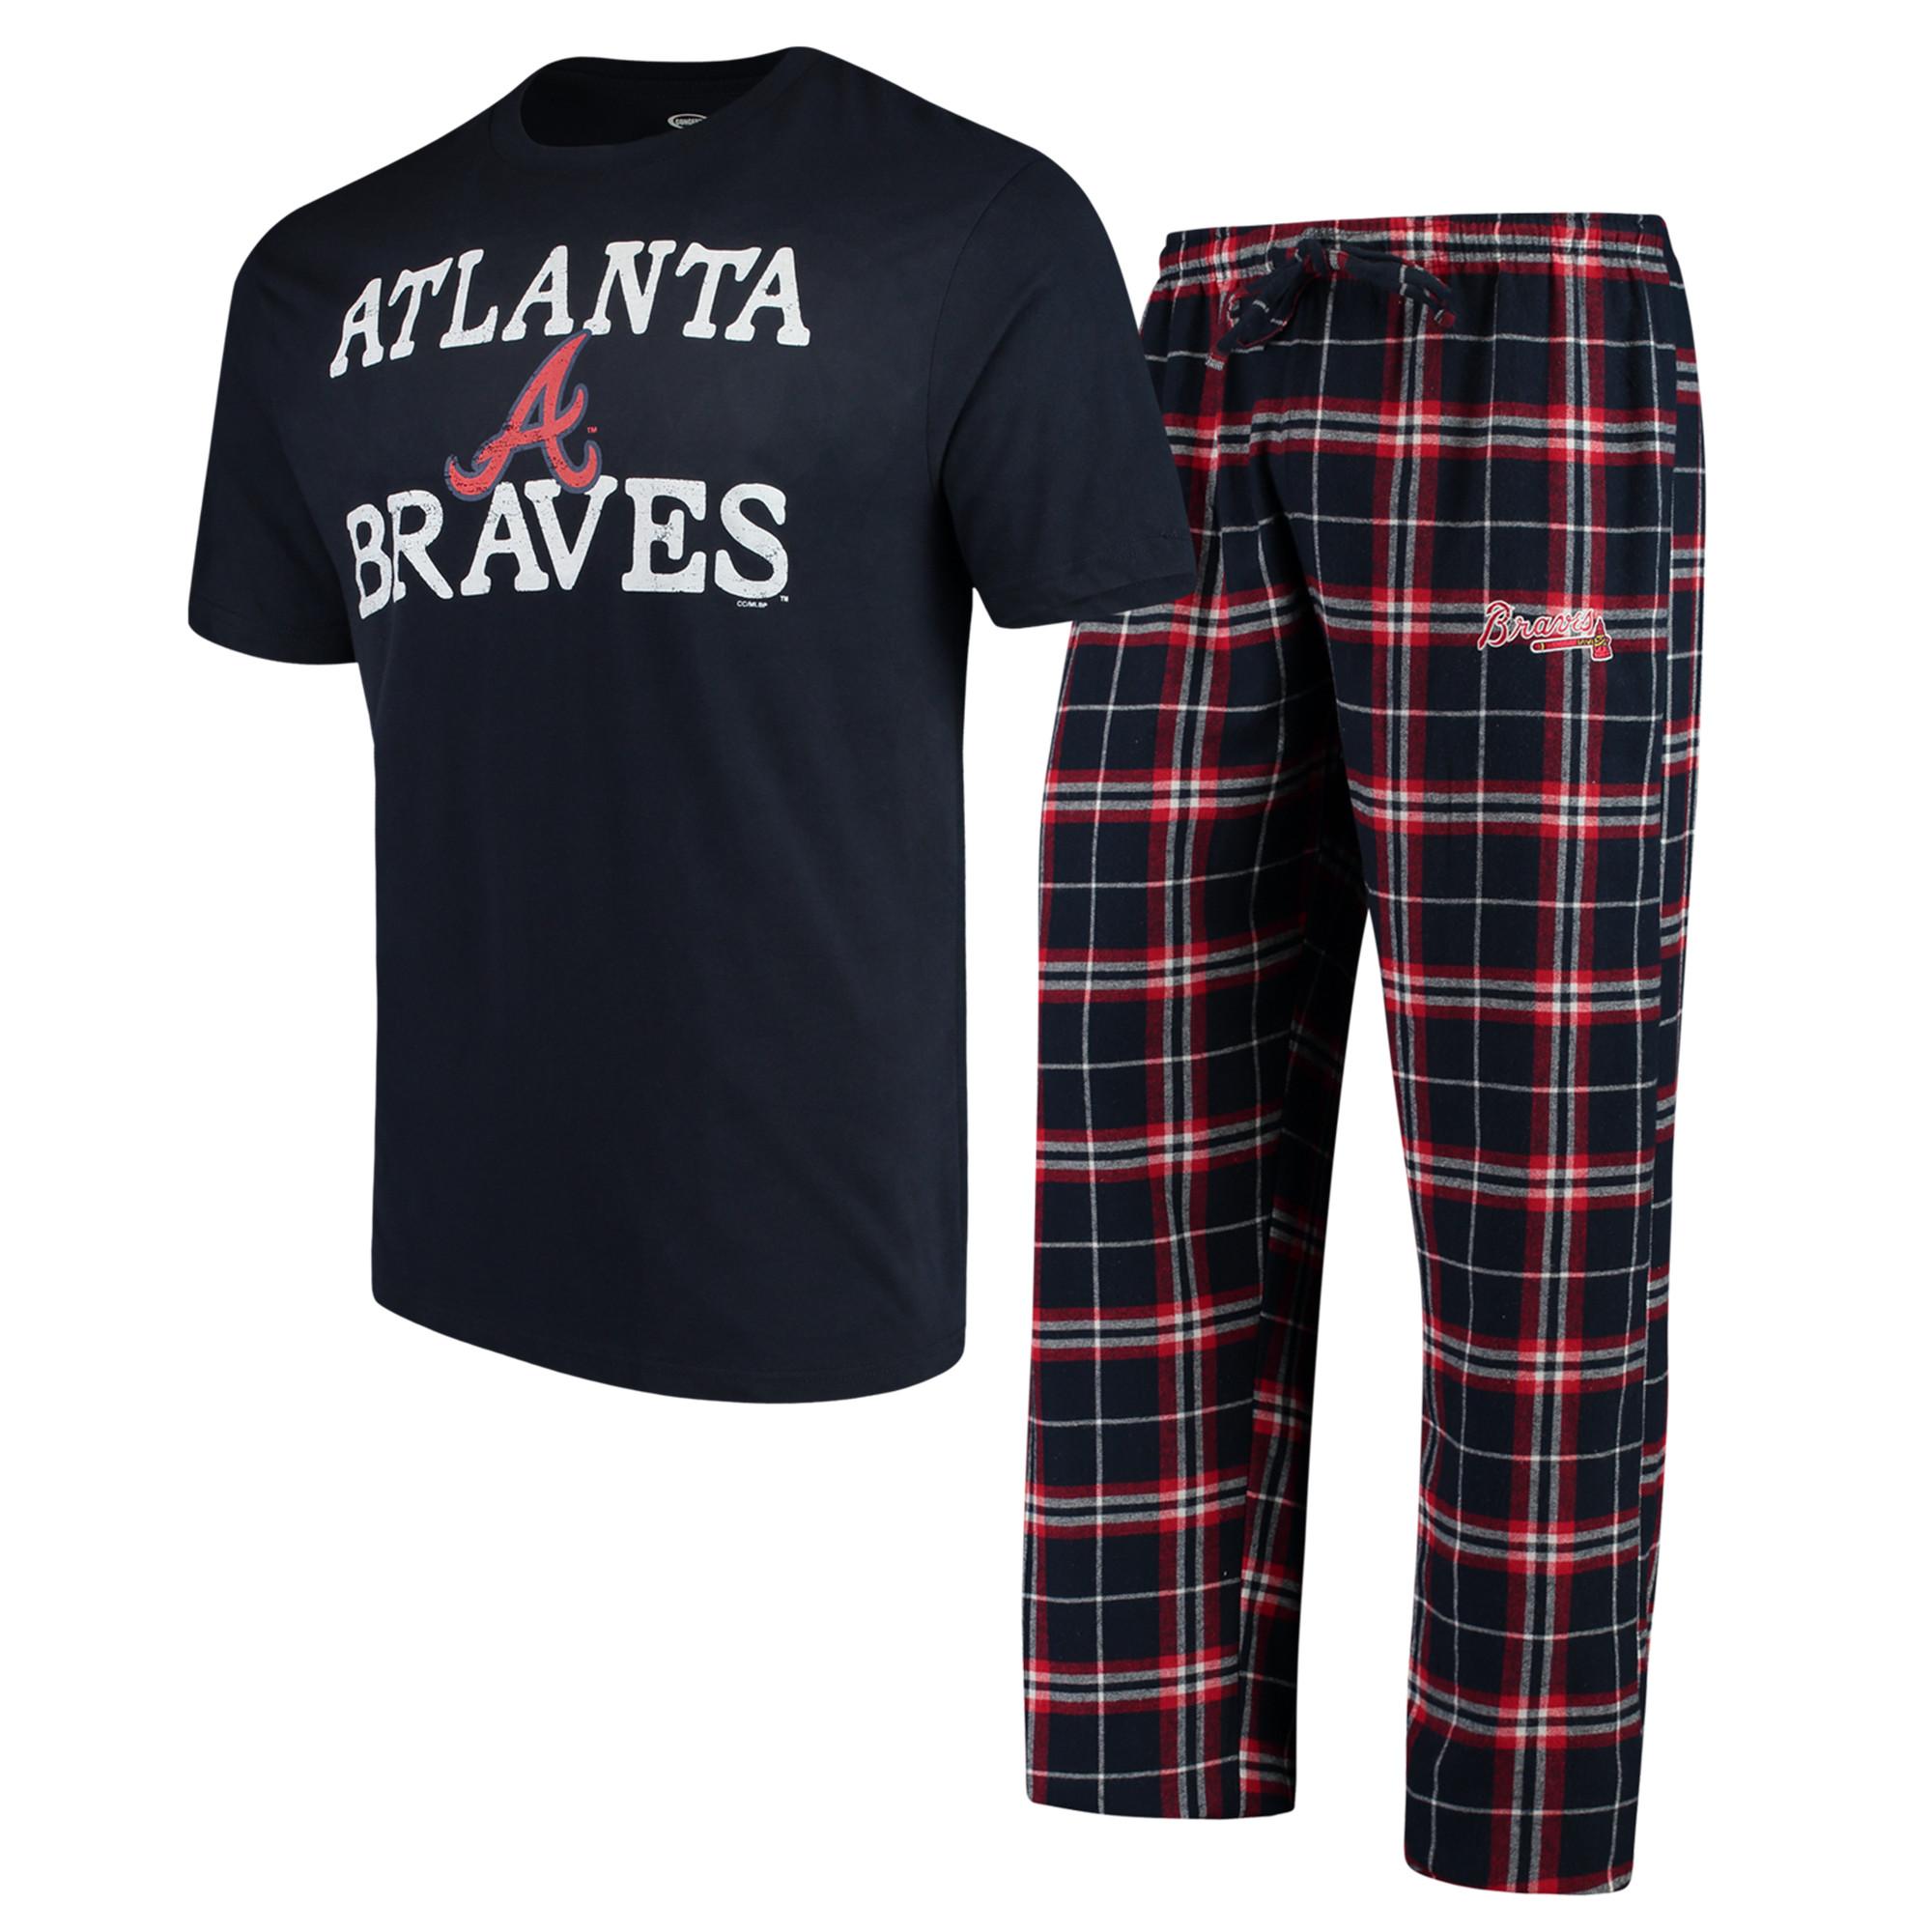 Atlanta Braves Concepts Sport Duo Pants & Top Set - Navy